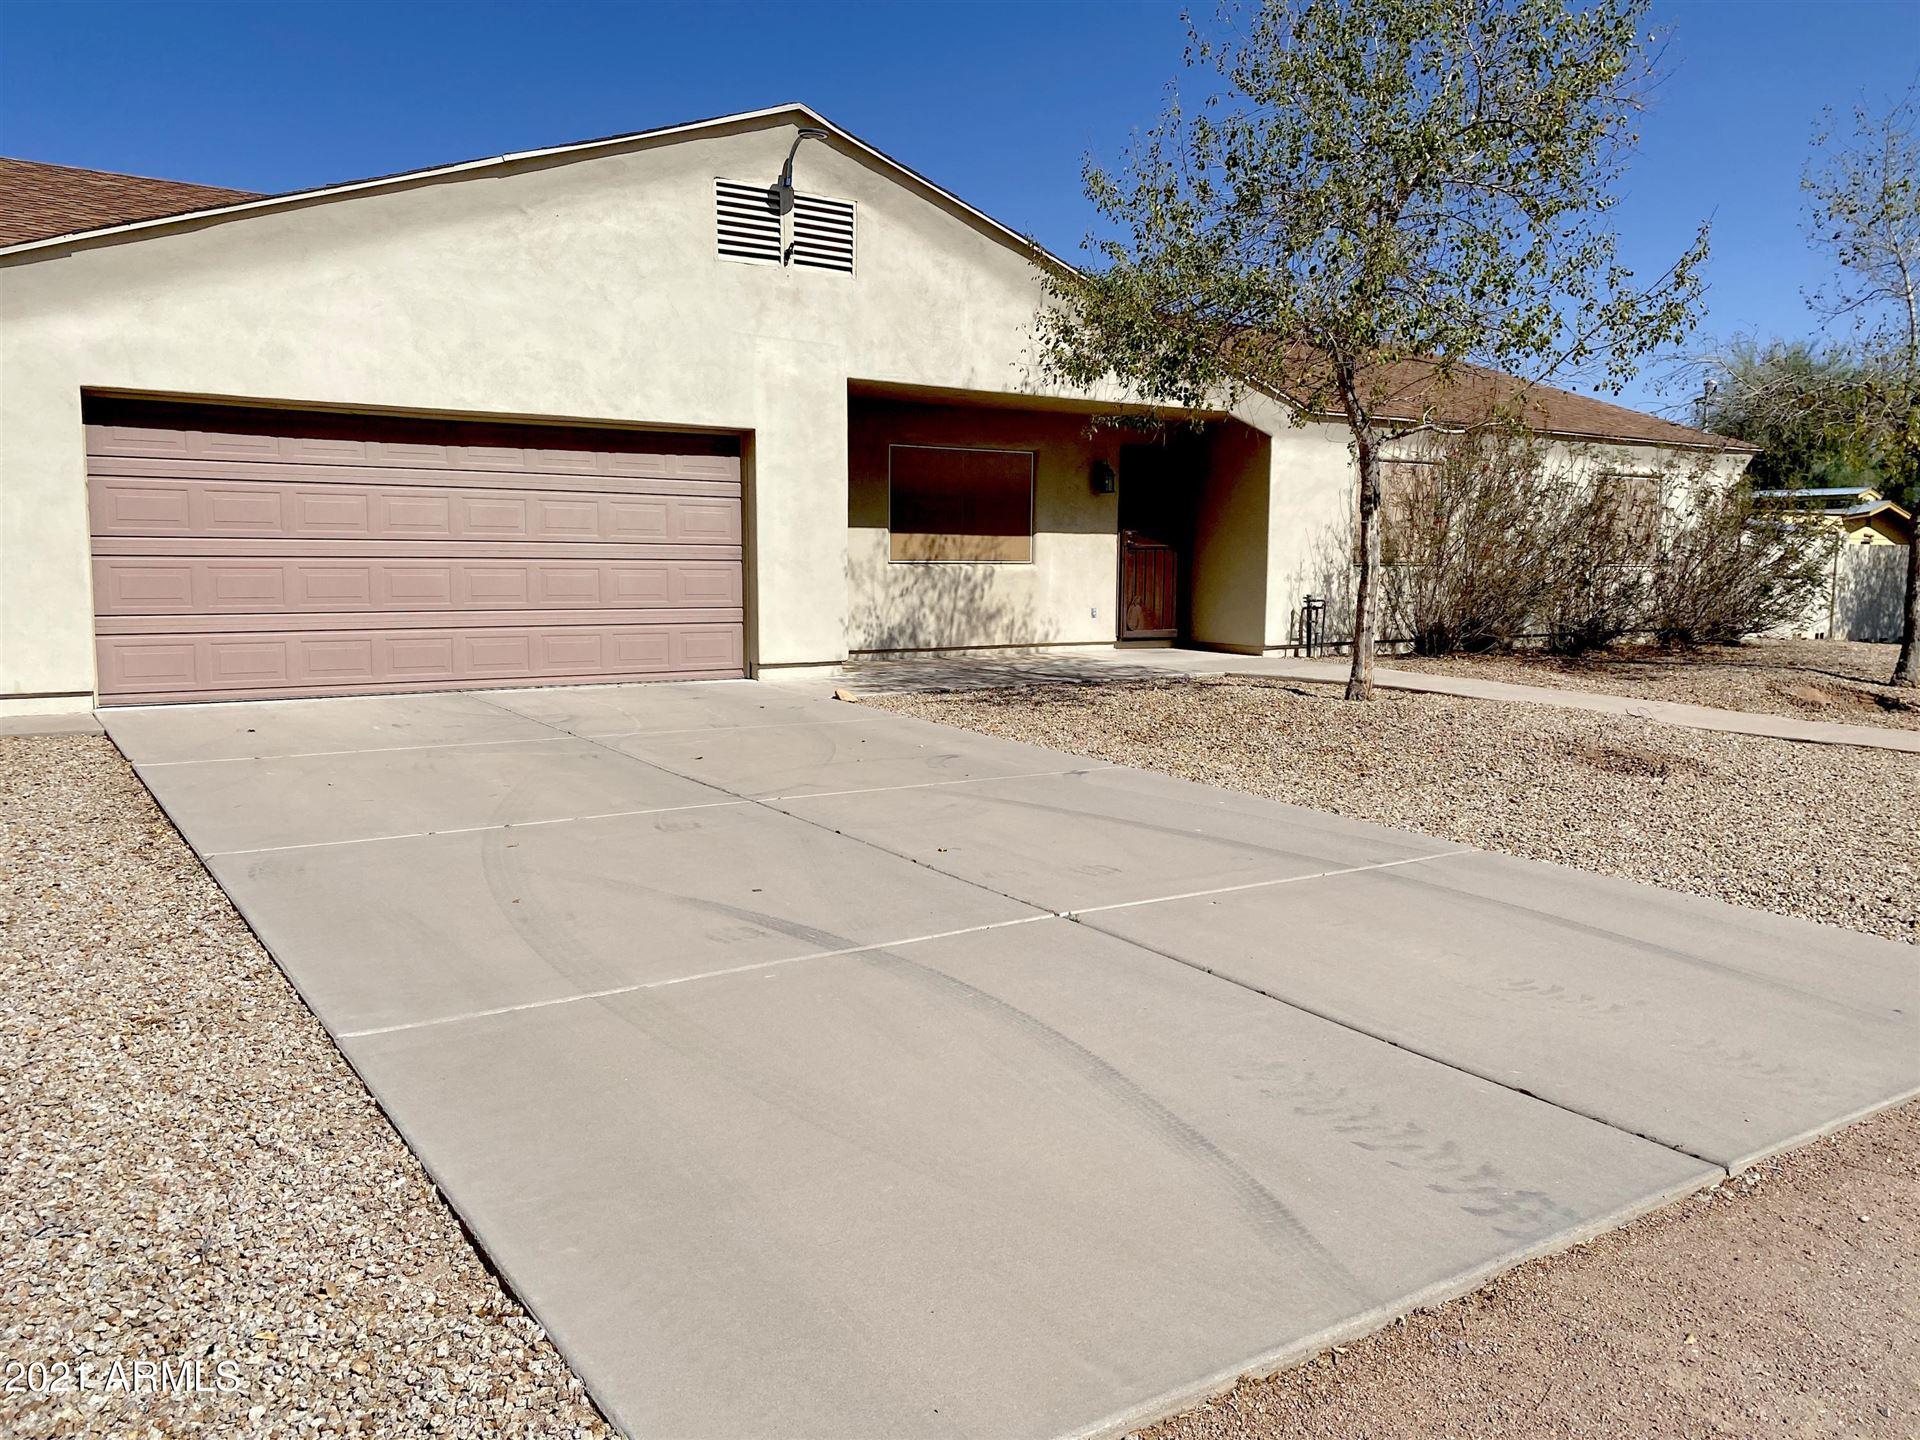 535 N 100TH Place, Mesa, AZ 85207 - MLS#: 6234457